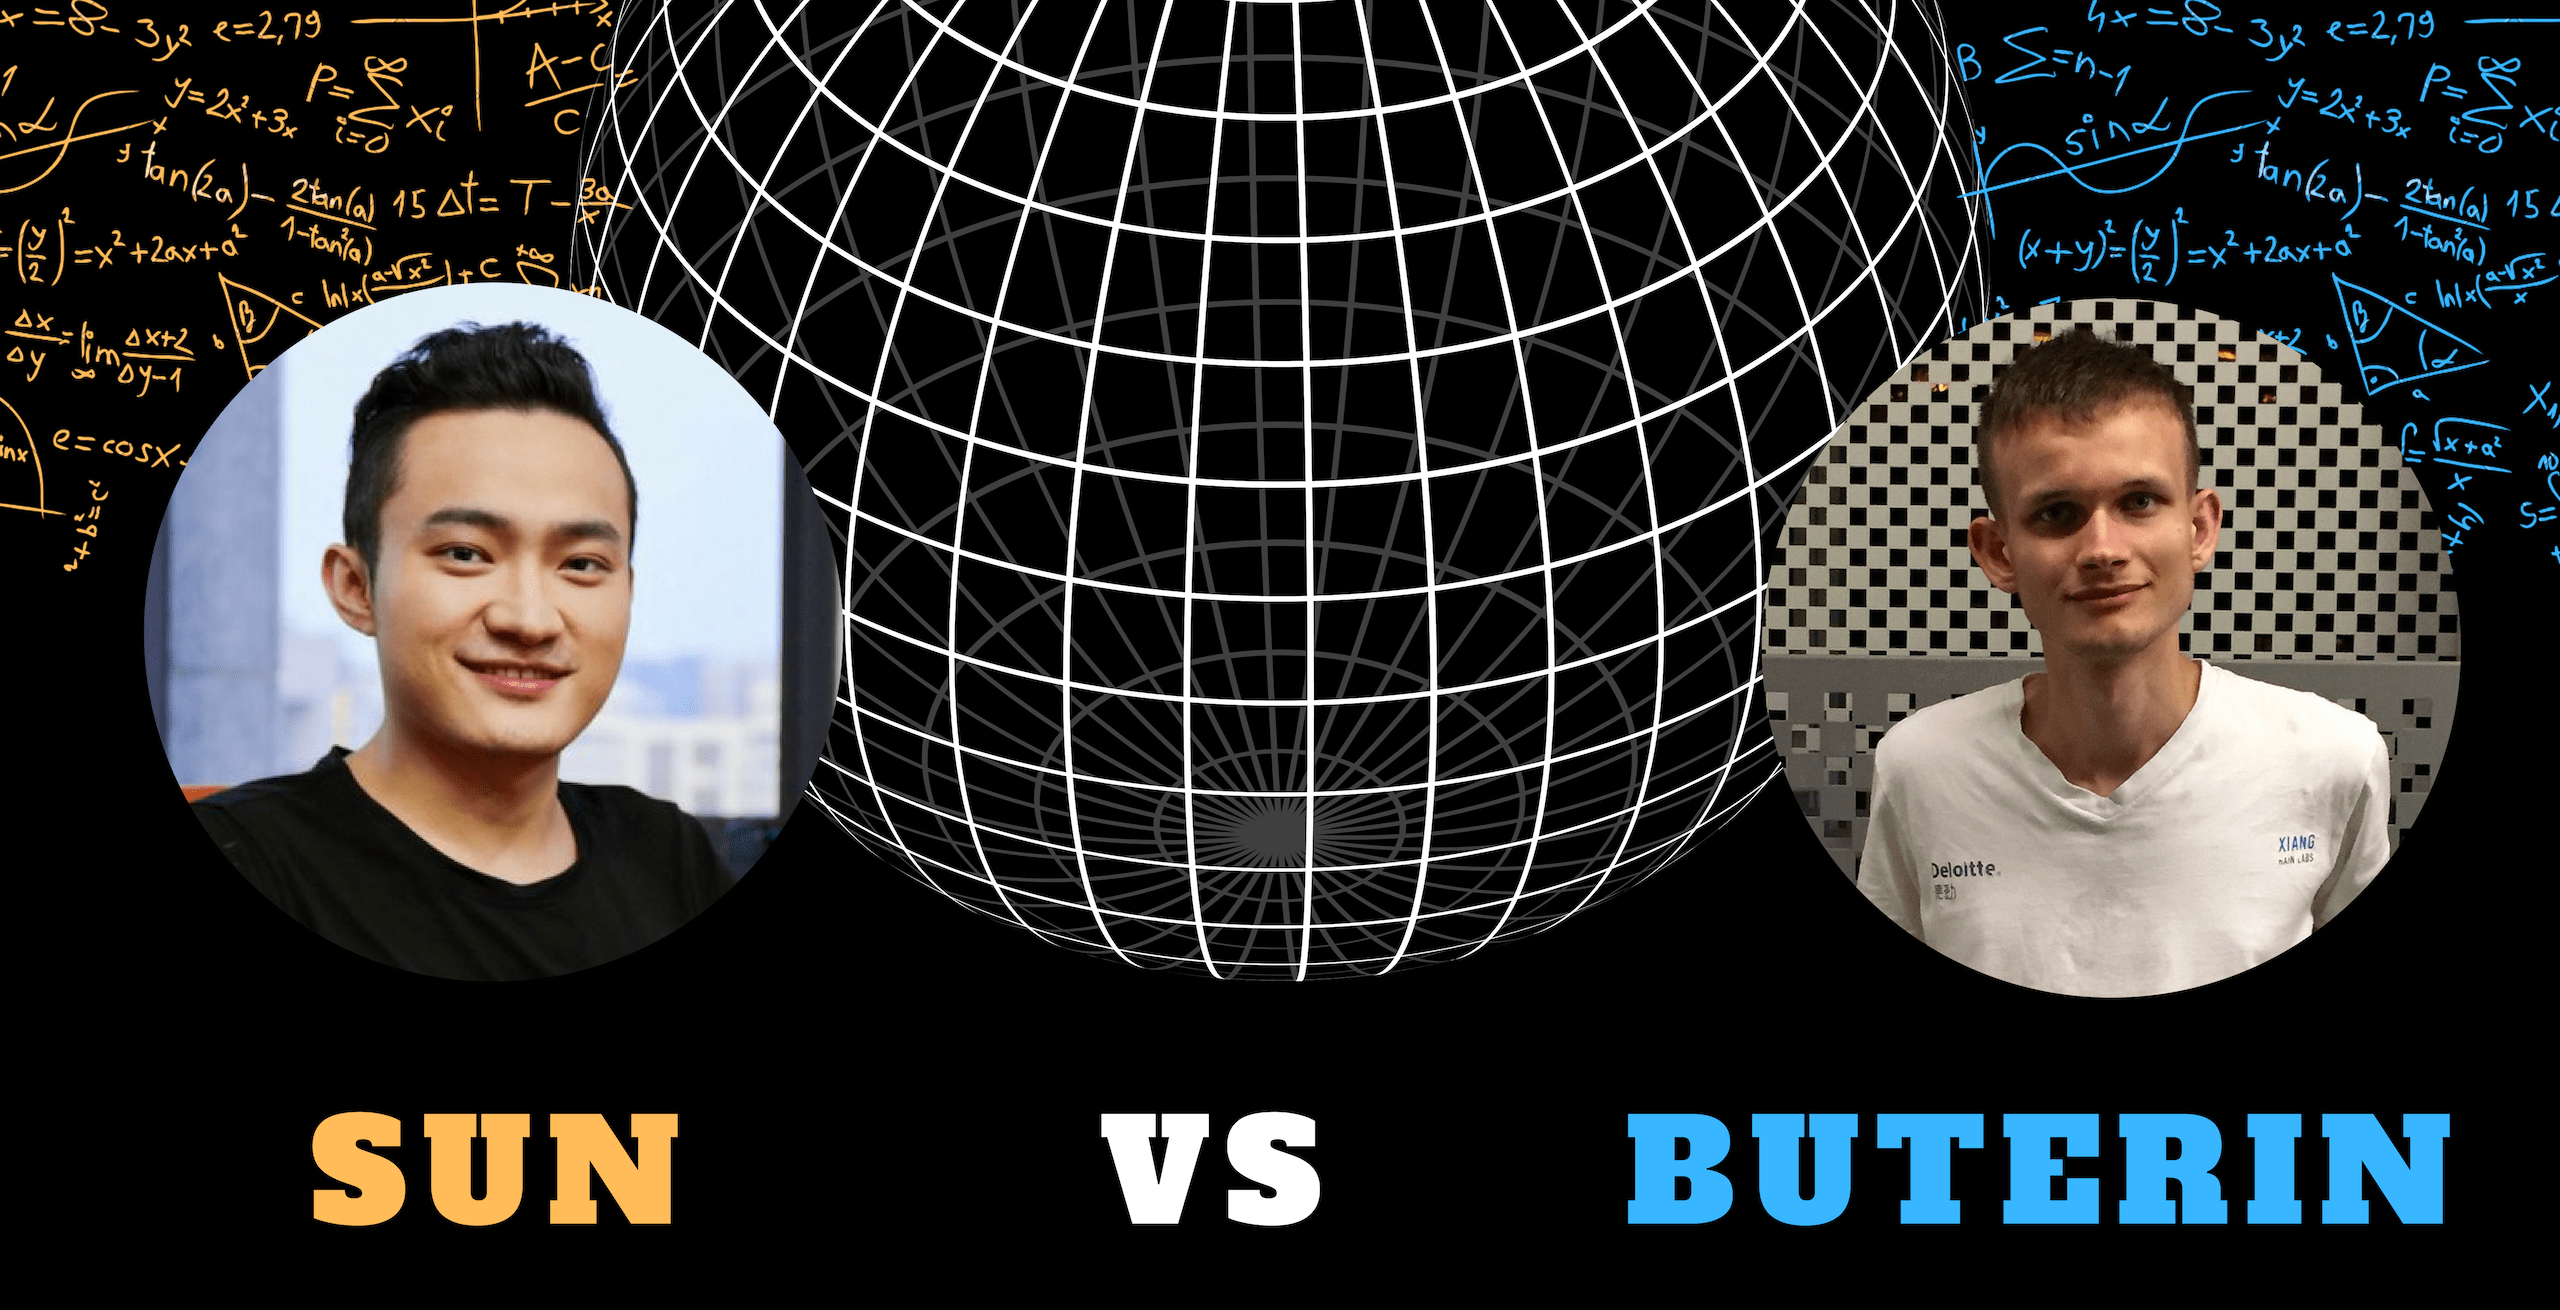 Justin Sun vs Vitalik Buterin